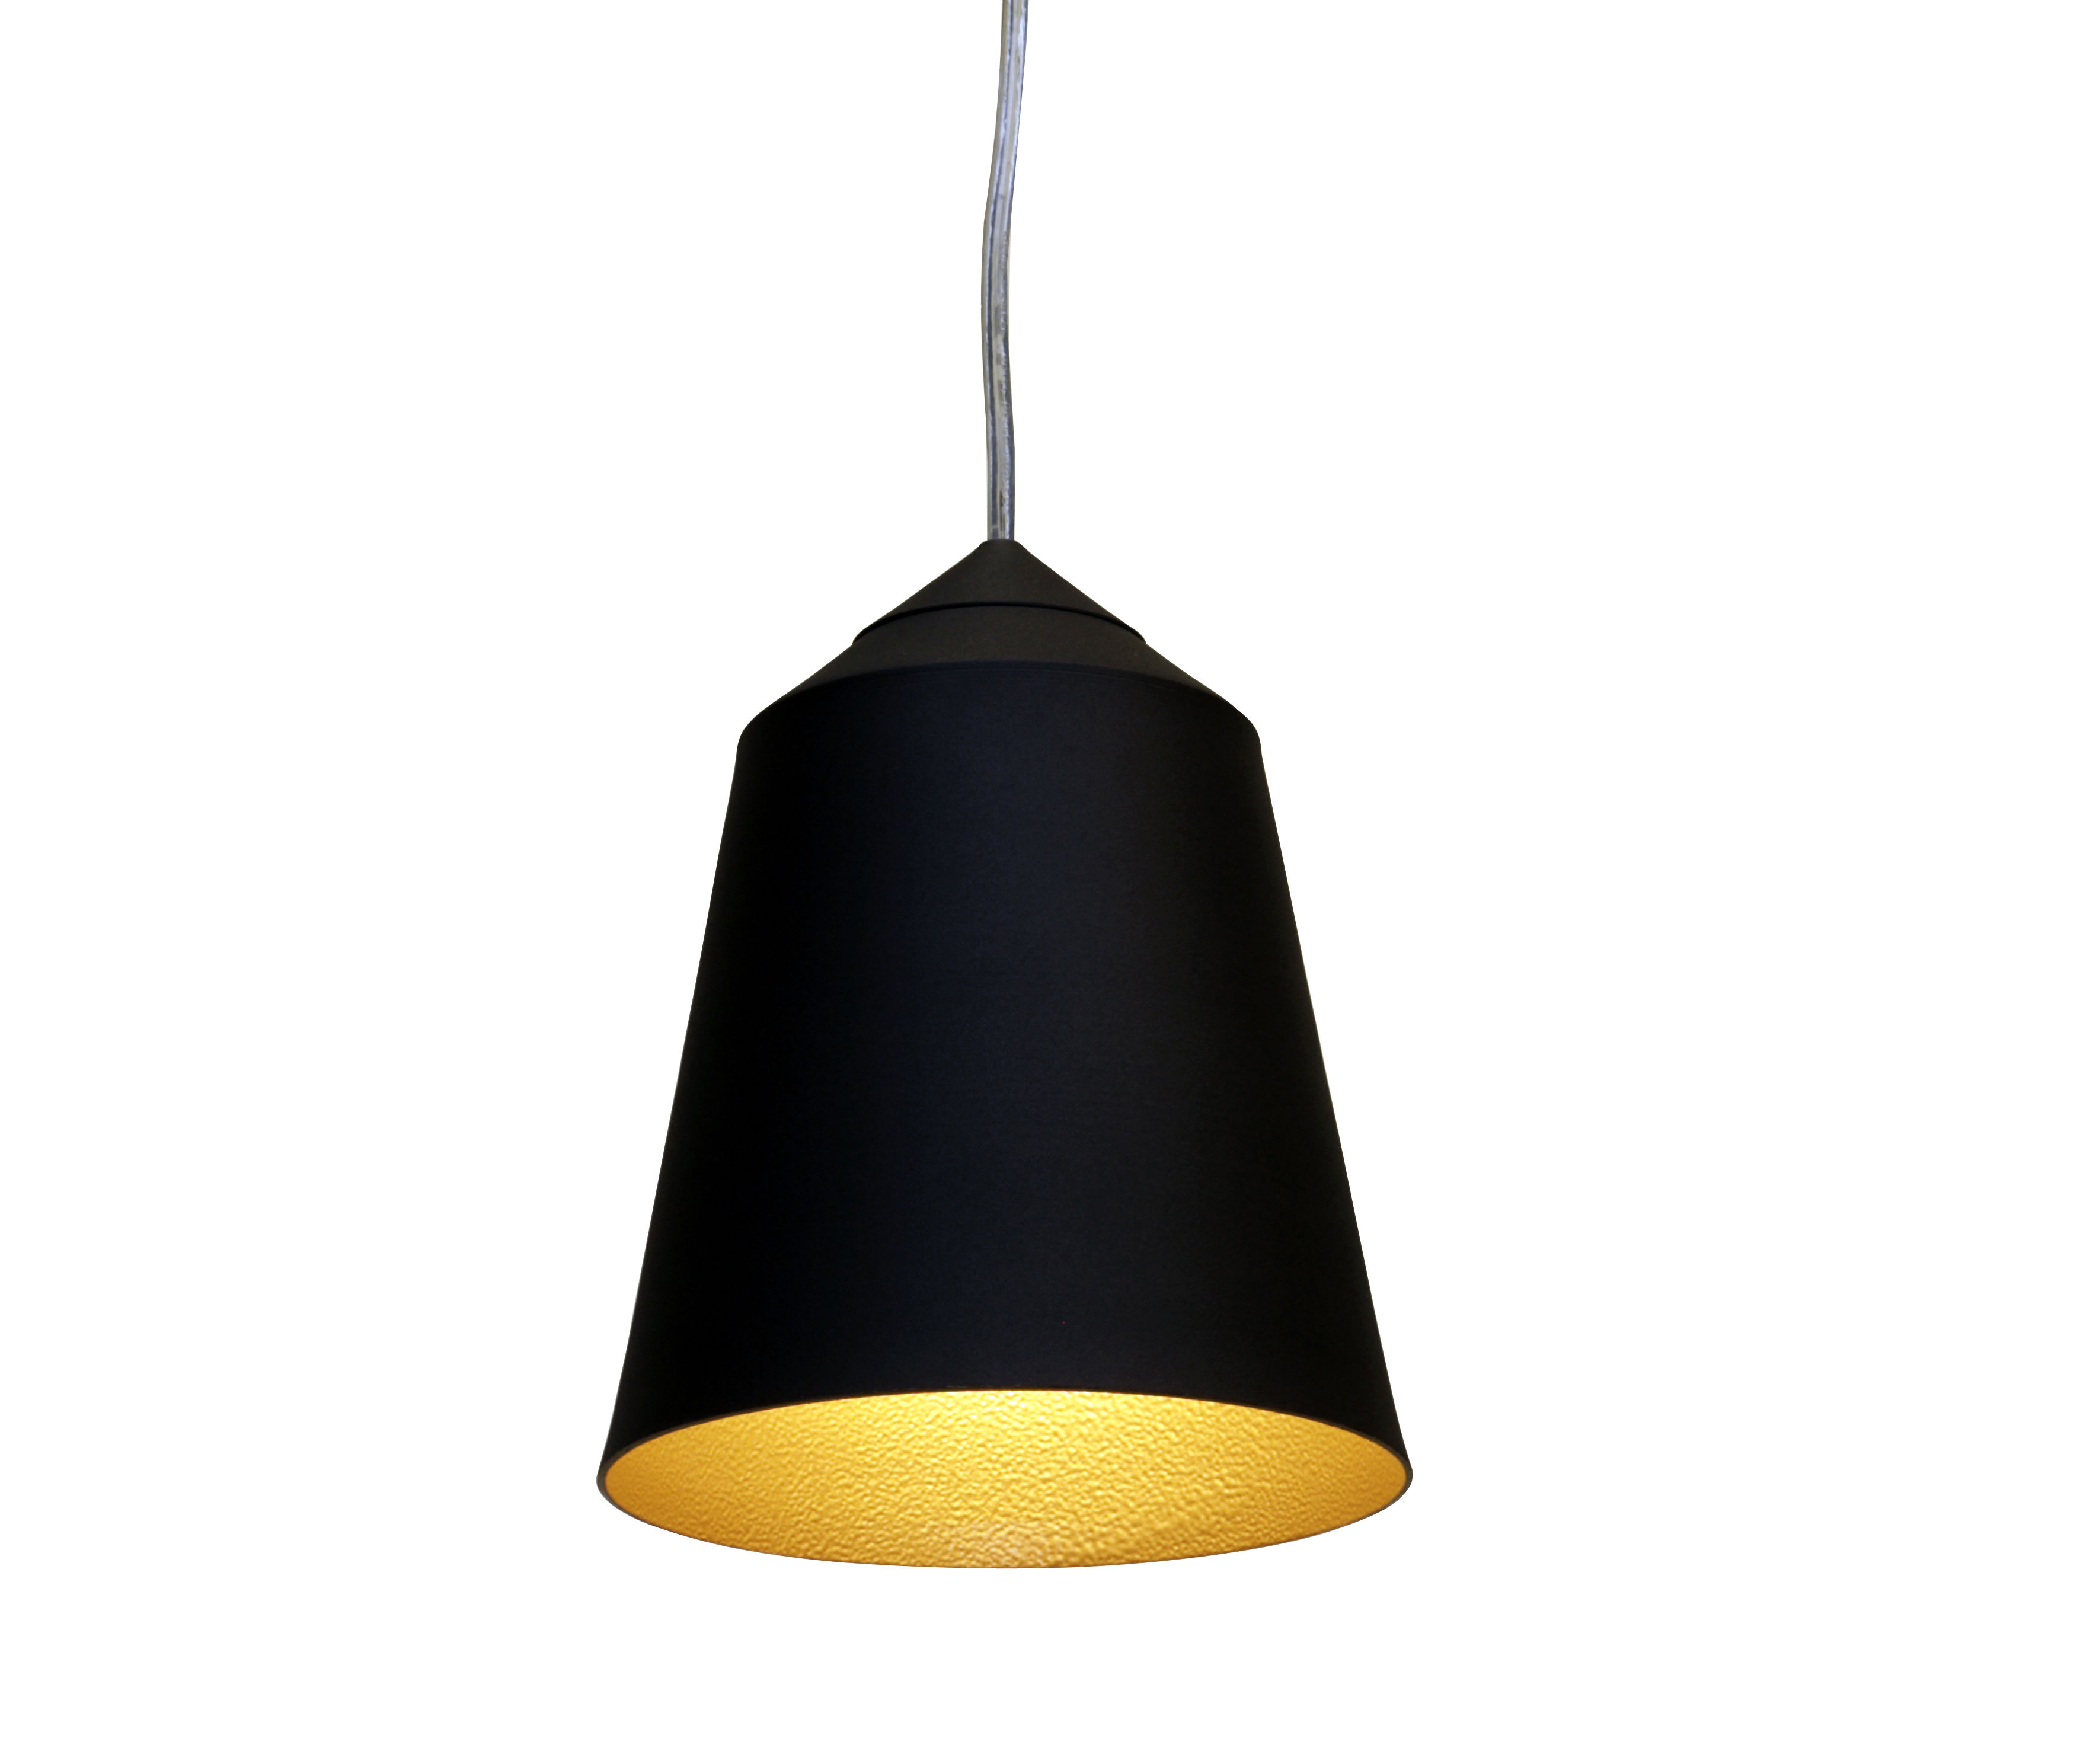 Leuchten - Pendelleuchten - Circus Small Pendelleuchte Ø 15 x H 19 cm - Innermost - Schwarz, matt / innen goldfarben - Aluminium